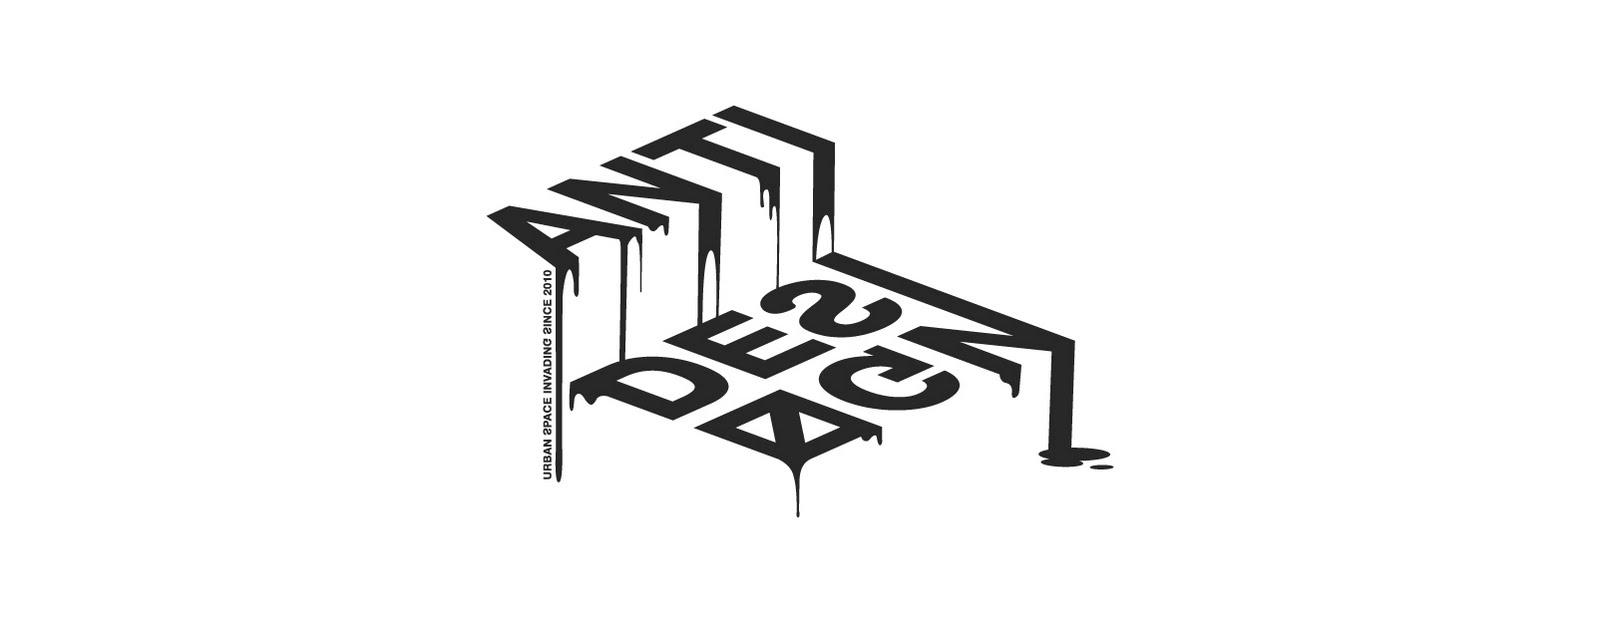 antidesign